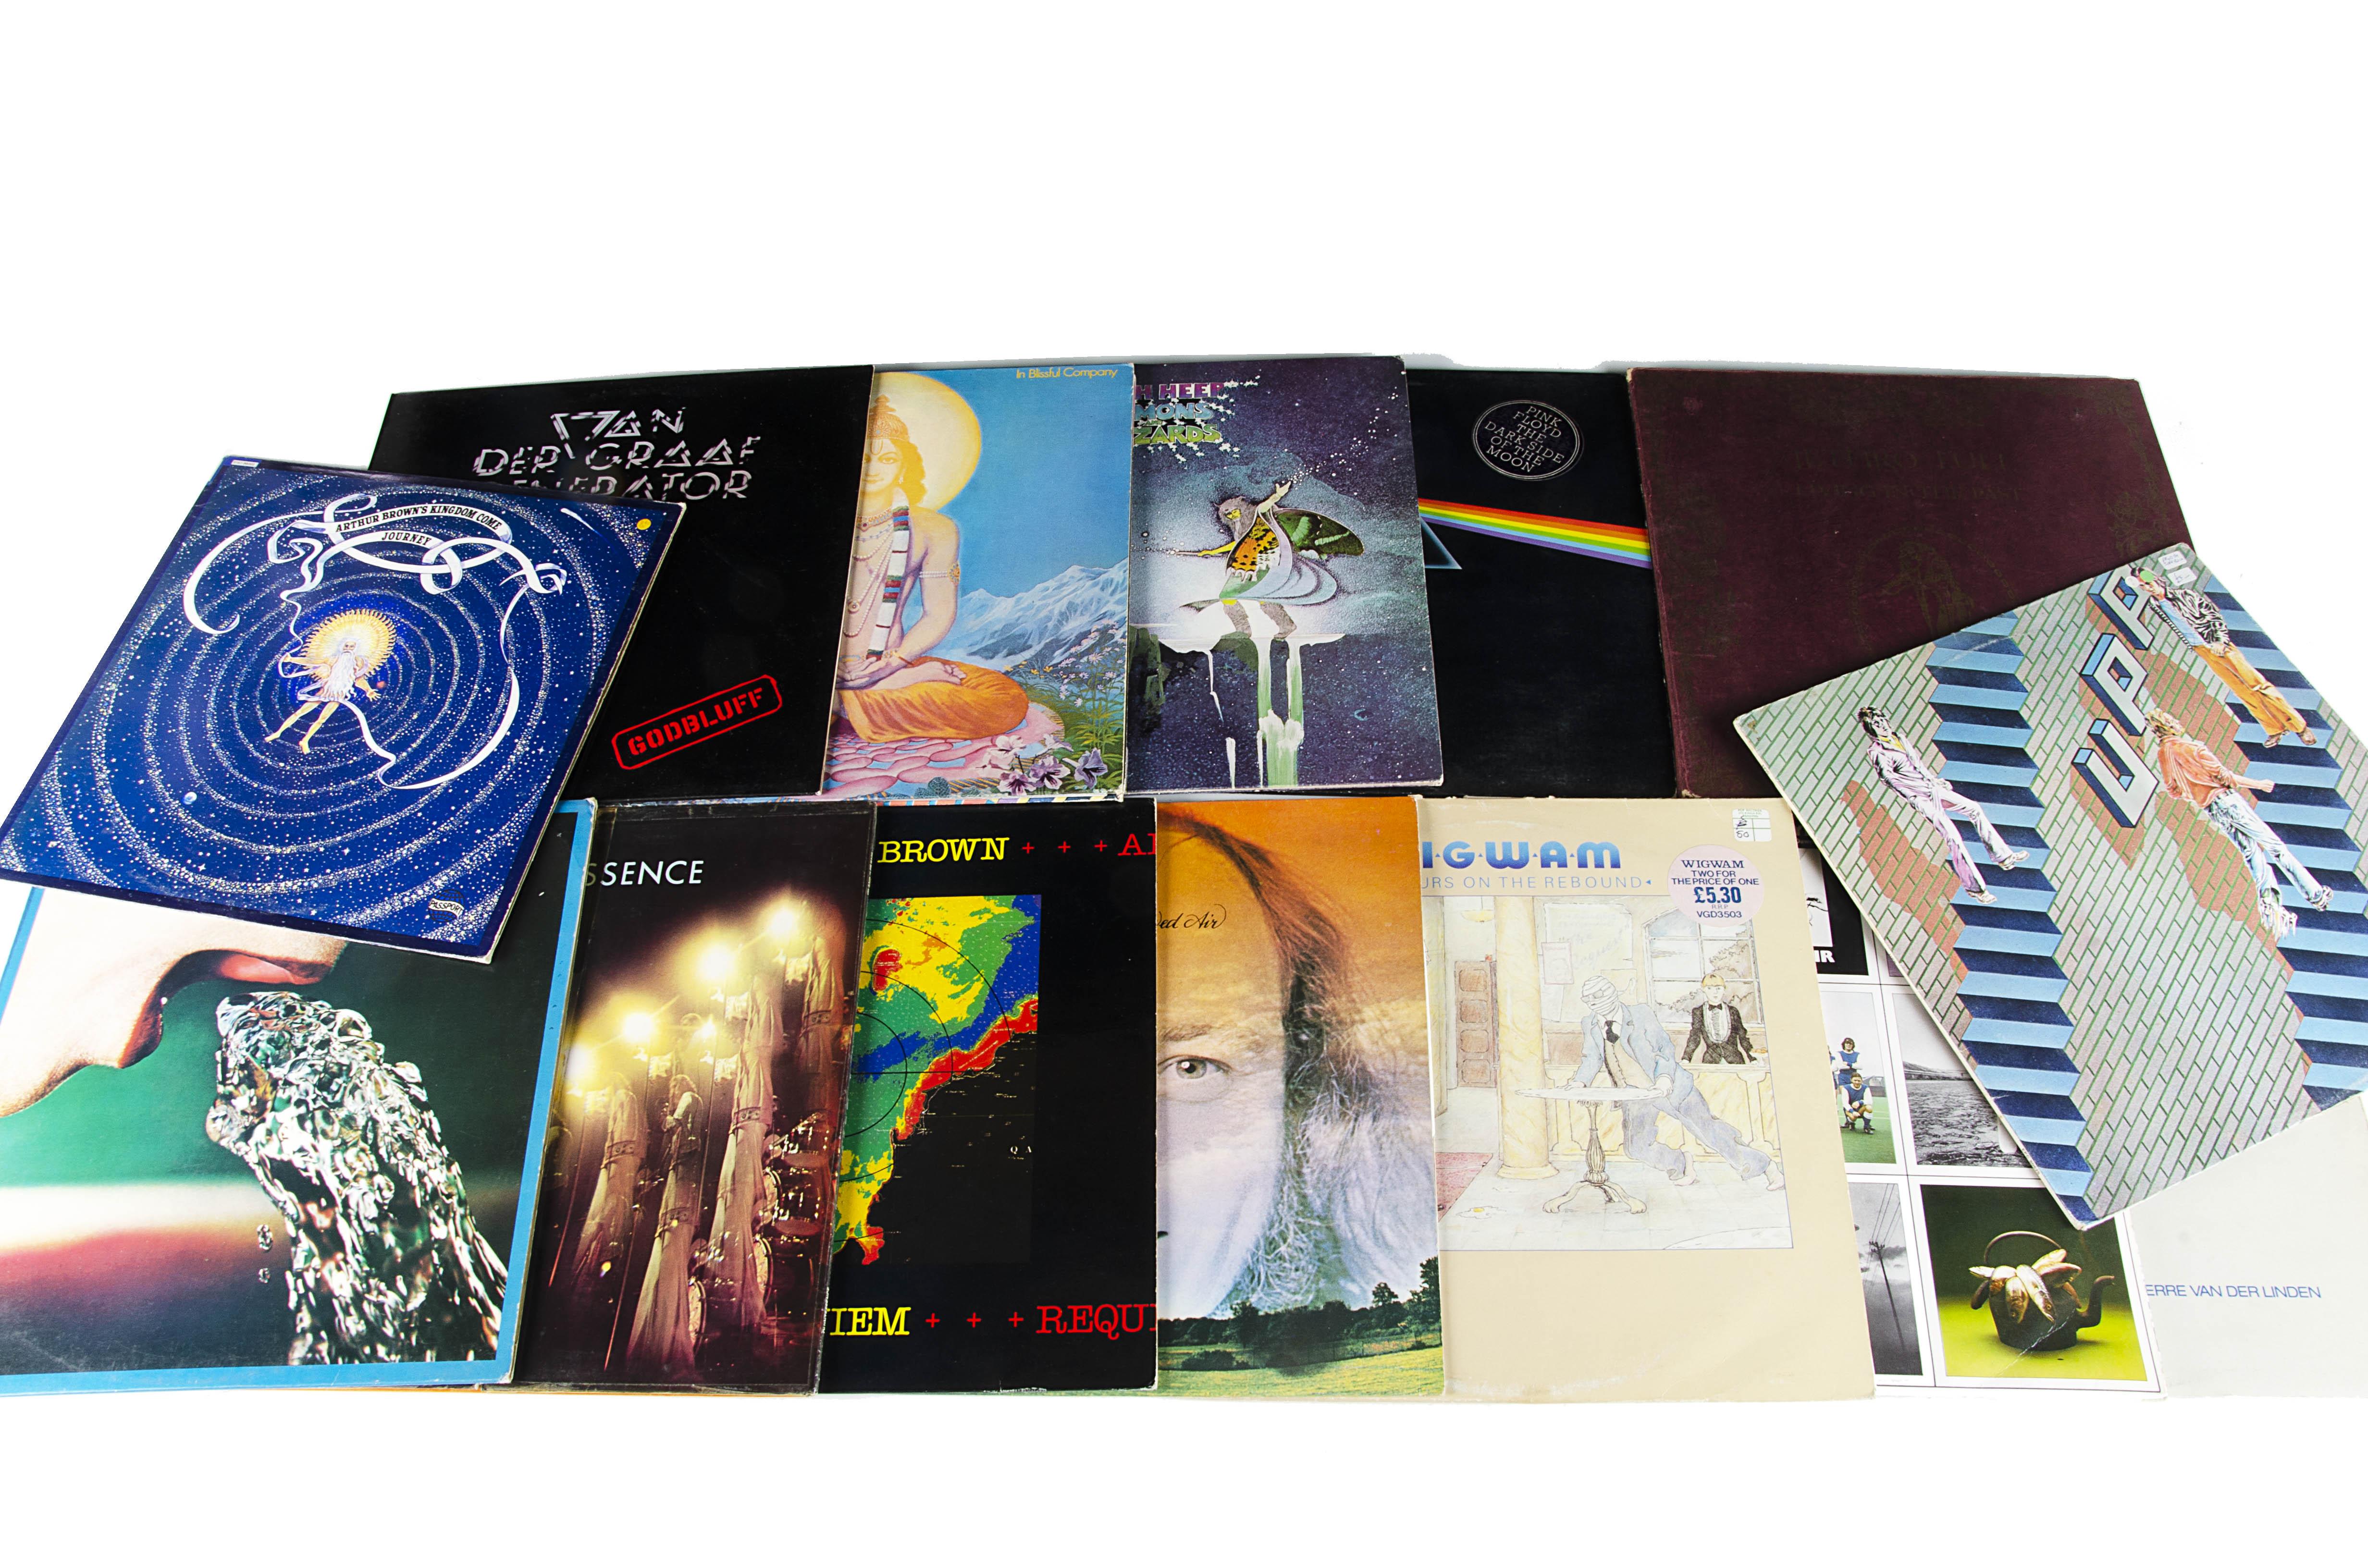 Progressive Rock LPs, fourteen albums of mainly Prog Rock with artists comprising Pink Floyd, Van